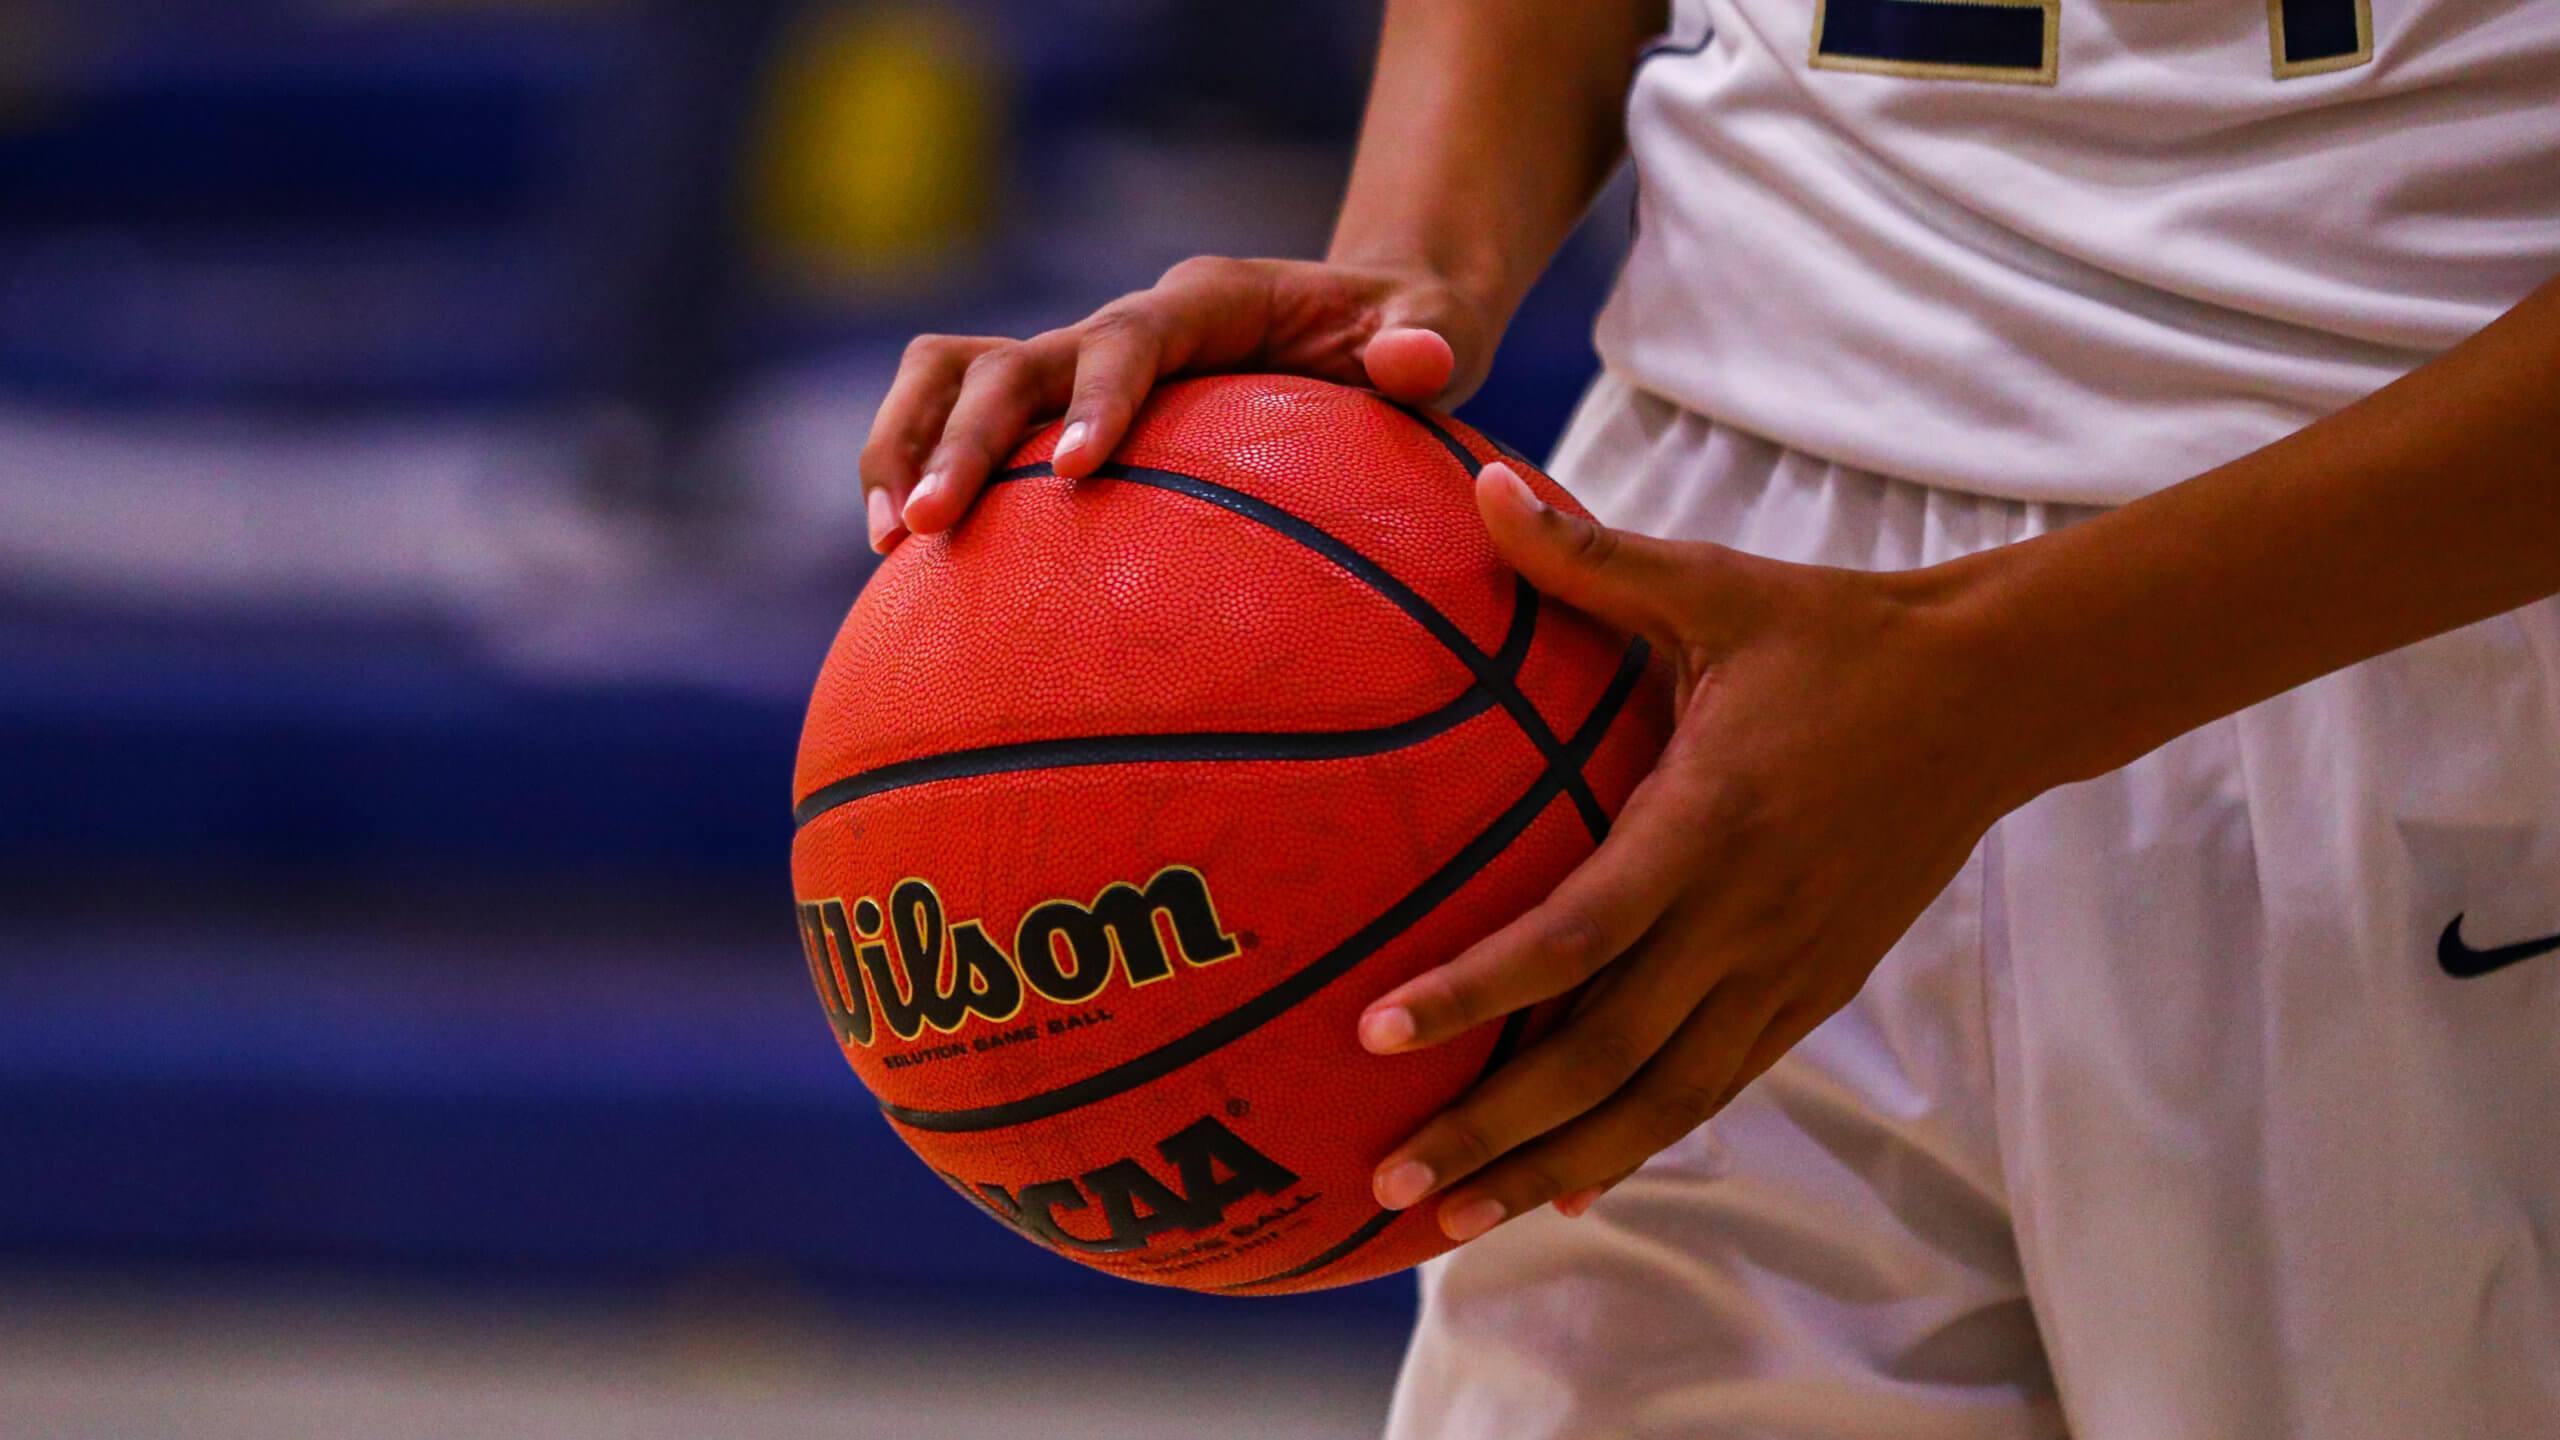 Players, teams to watch in Class 3A Arizona high school boys basketball - High School Sports News, Scores, Videos, Rankings - SBLive